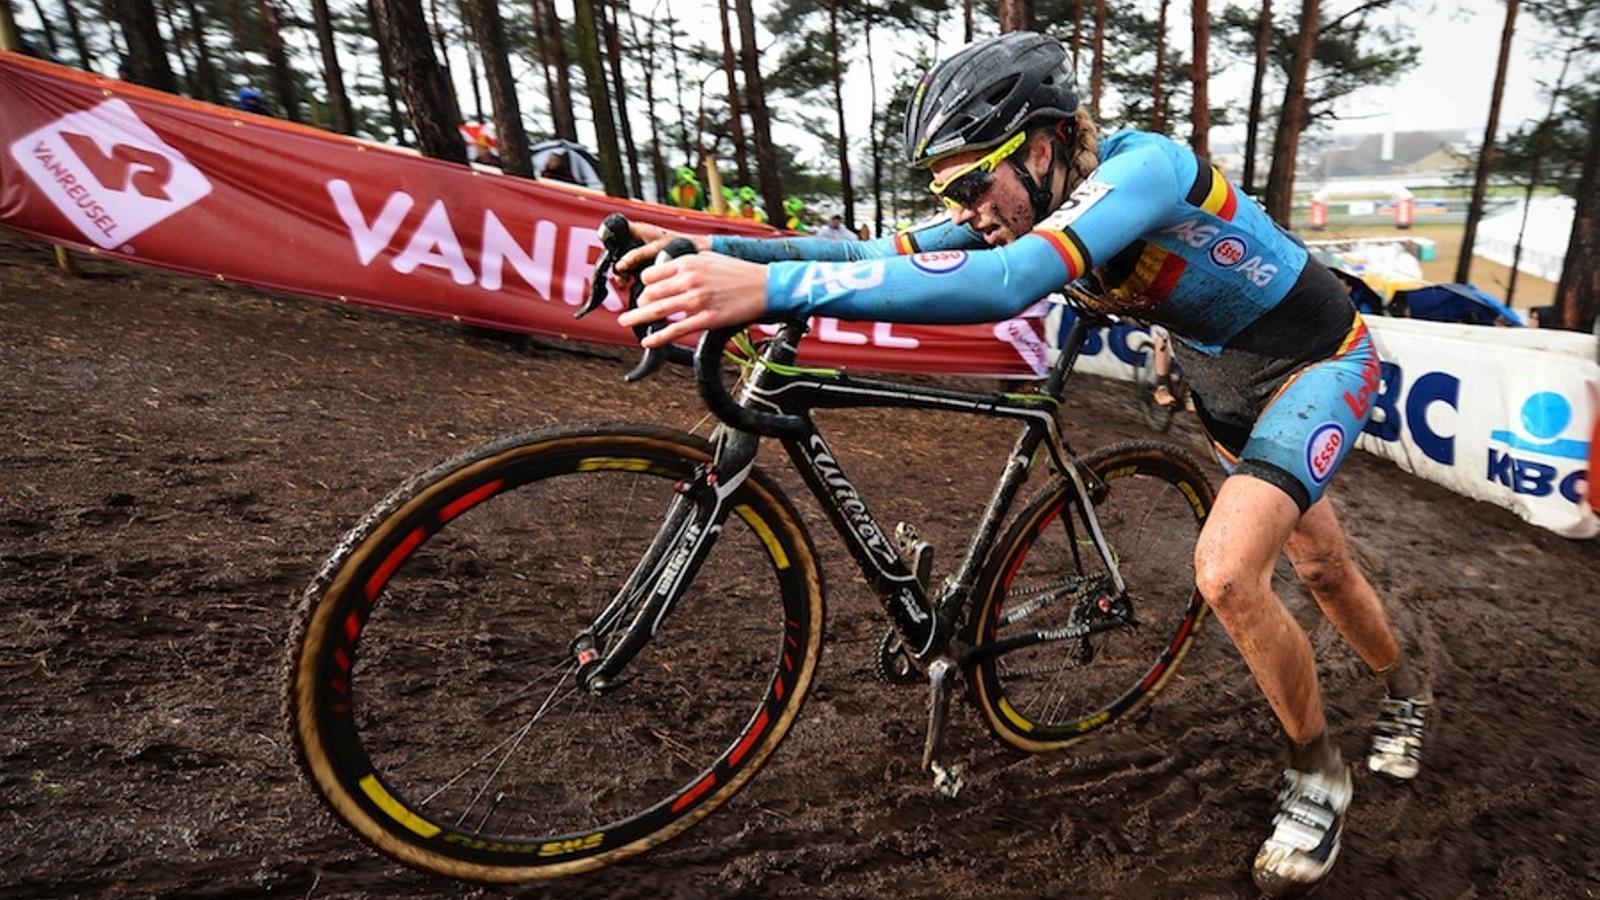 La belga Femke Van den Driessche durant el Mundial de ciclocross